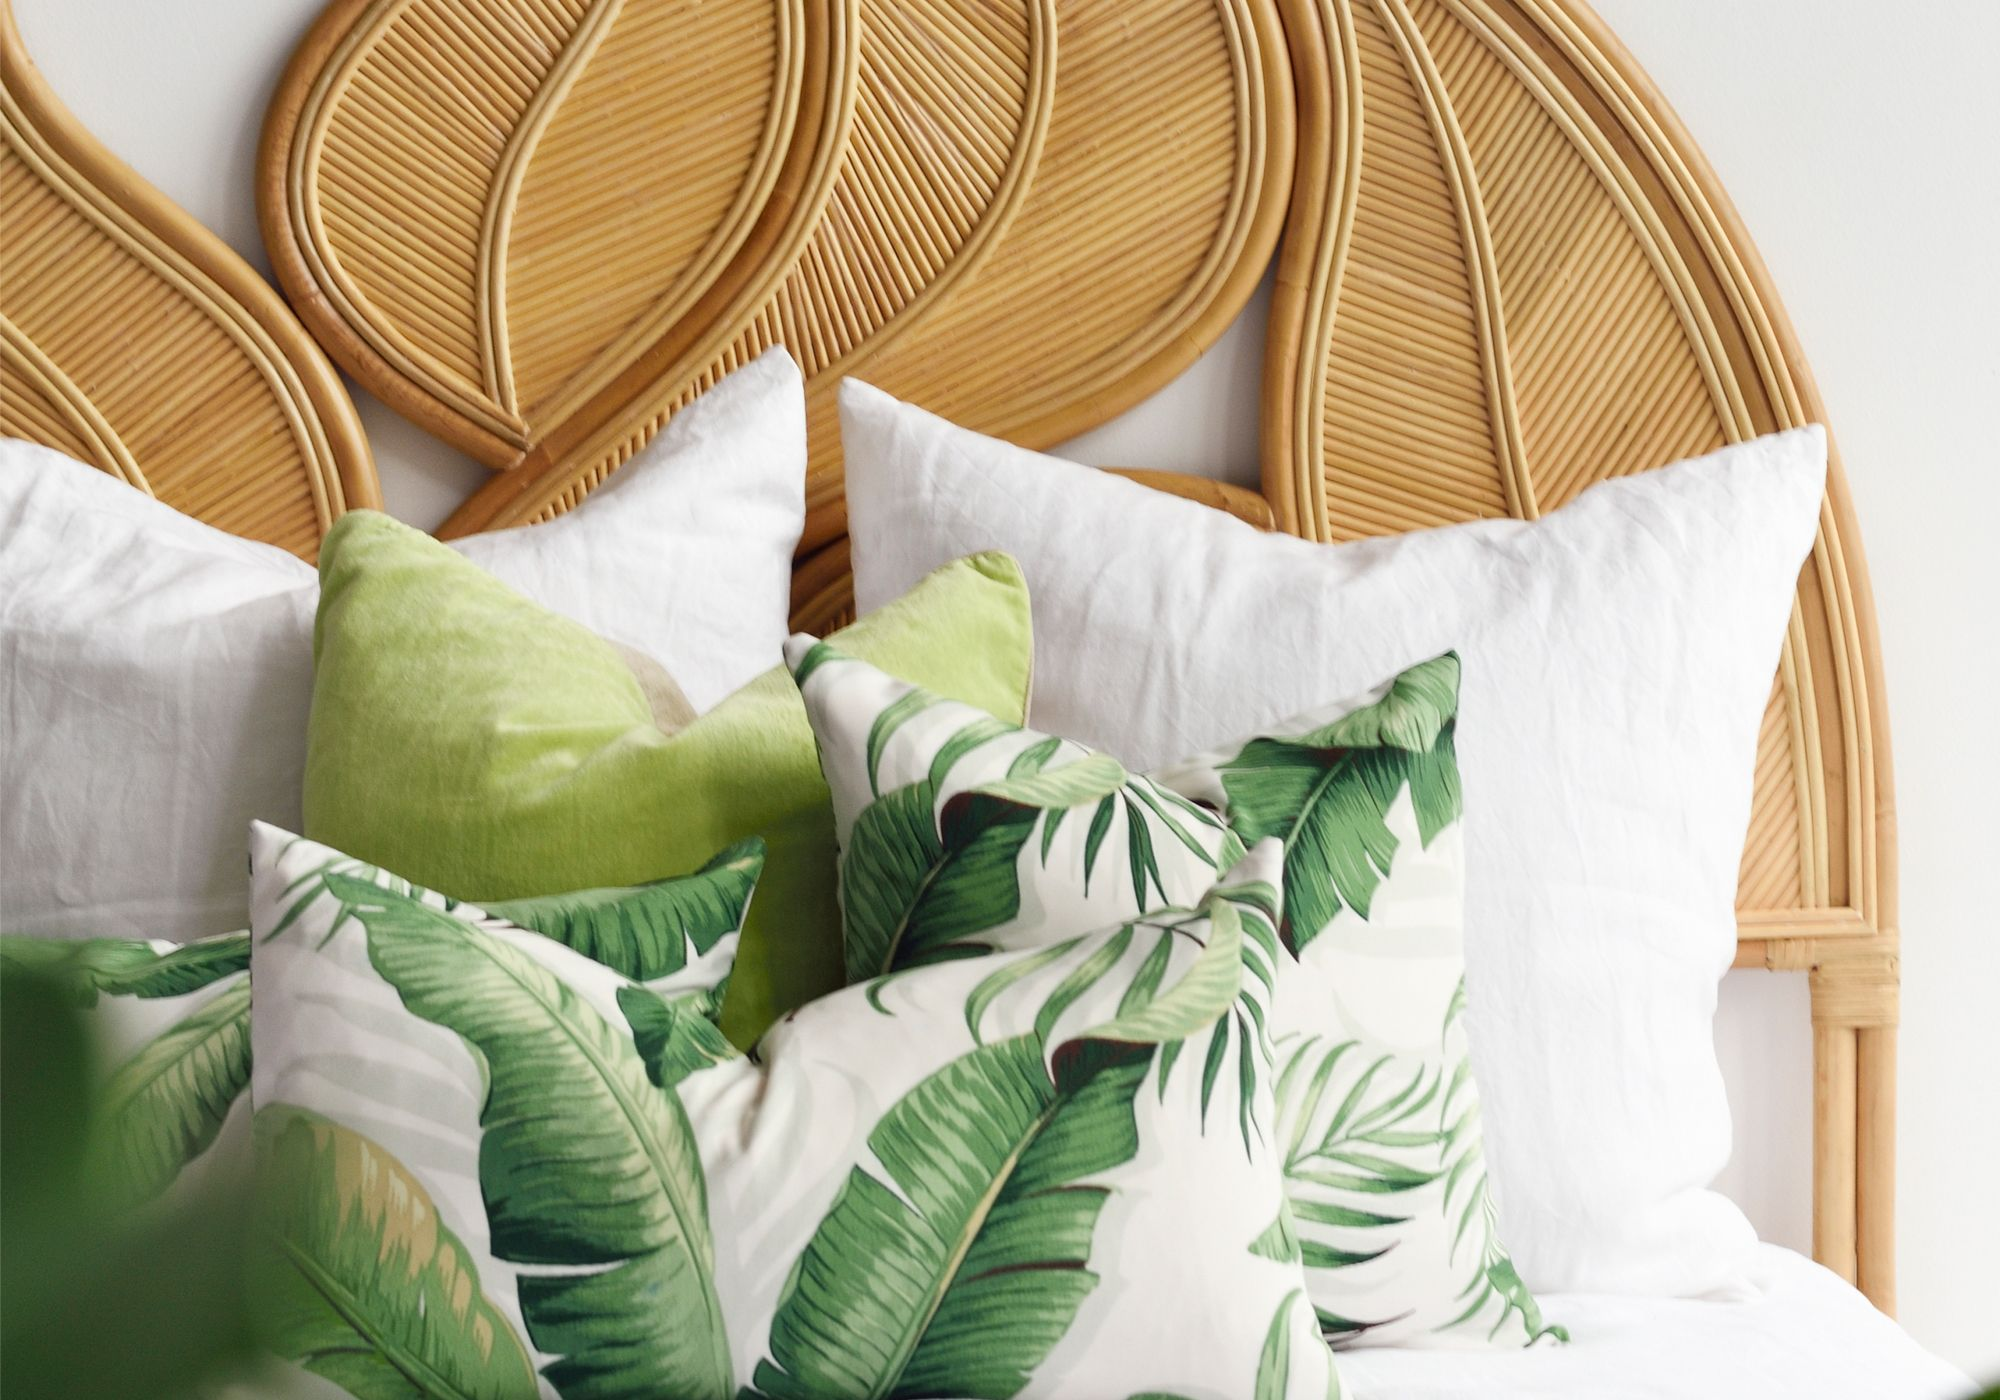 Island Living by Cocoon banana leaf palm headboard, from Island Living